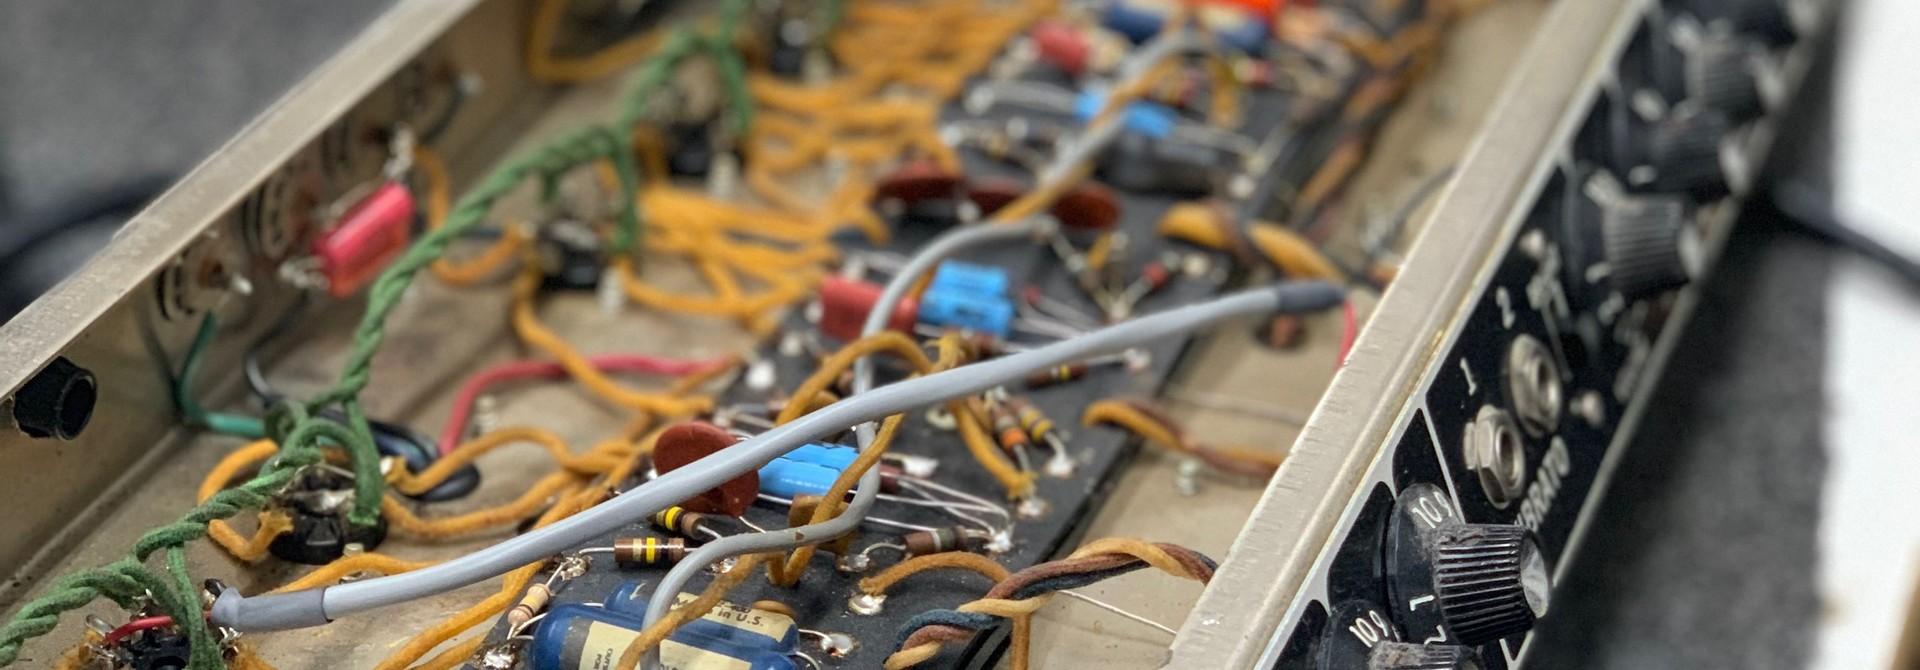 ELECTRONICS & AMP REPAIRS